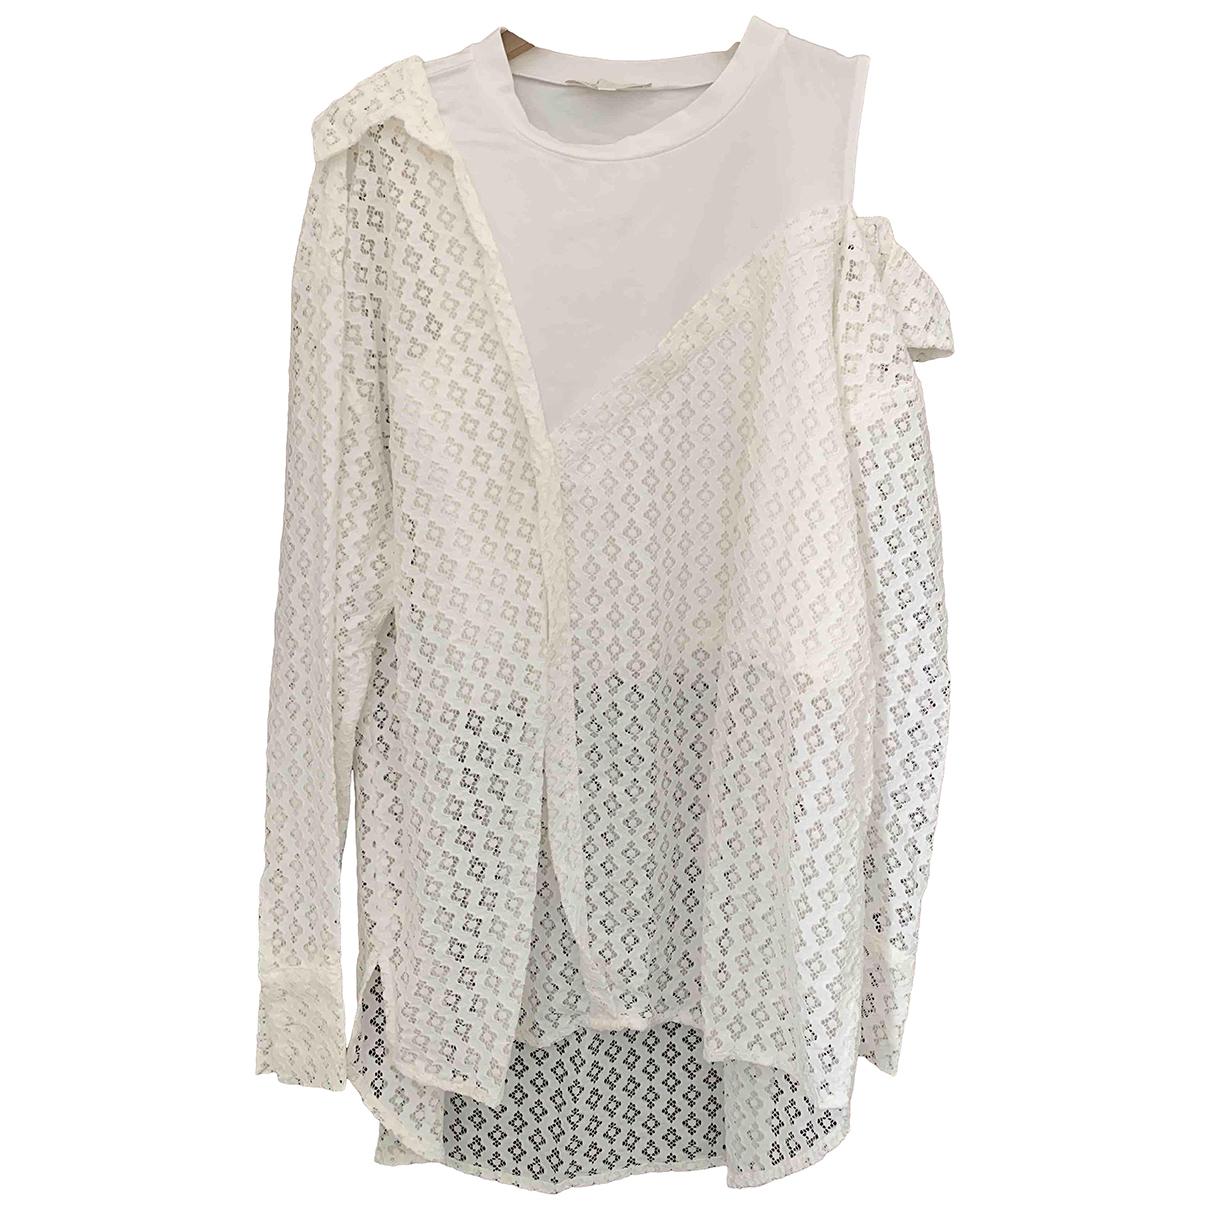 Maje - Top Spring Summer 2019 pour femme en coton - blanc